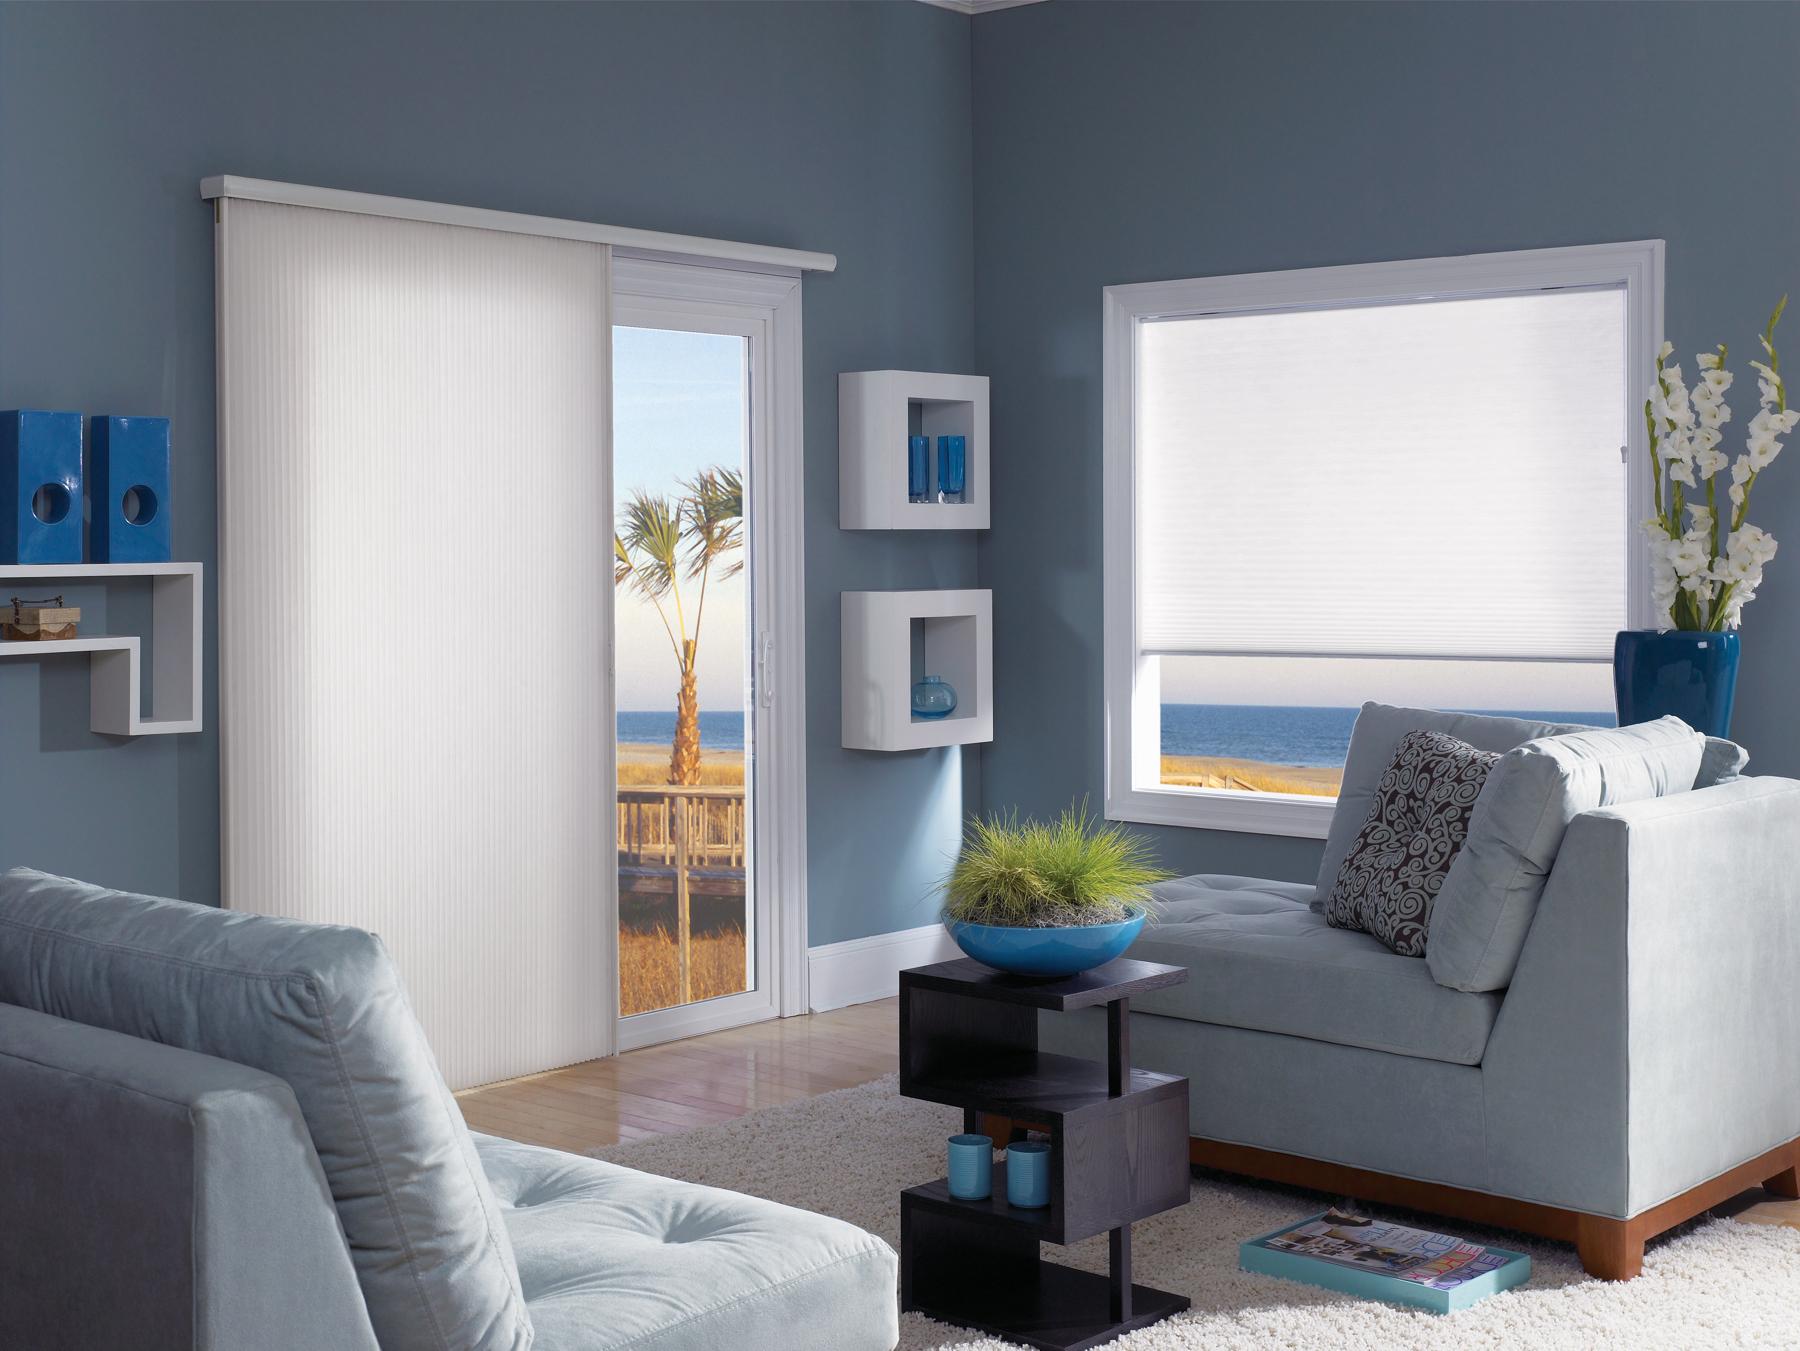 Best Variants Of Window Coverings For Sliding Glass Door